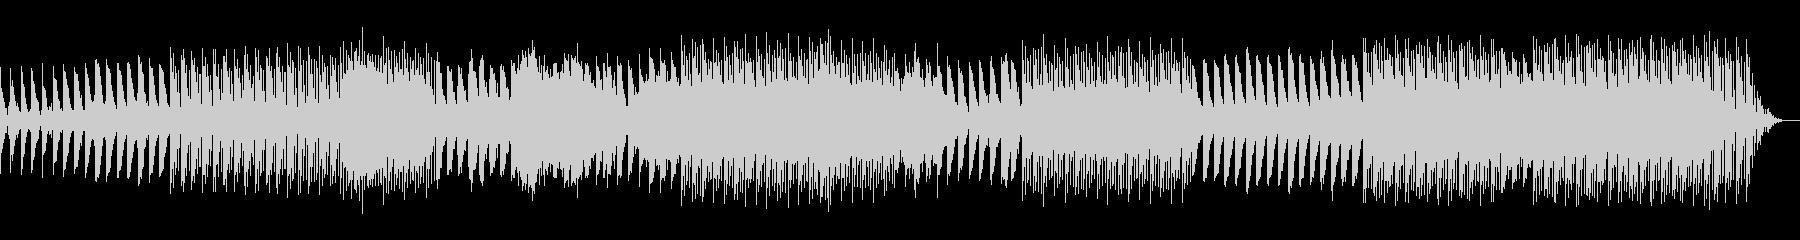 House 80s Classicの未再生の波形